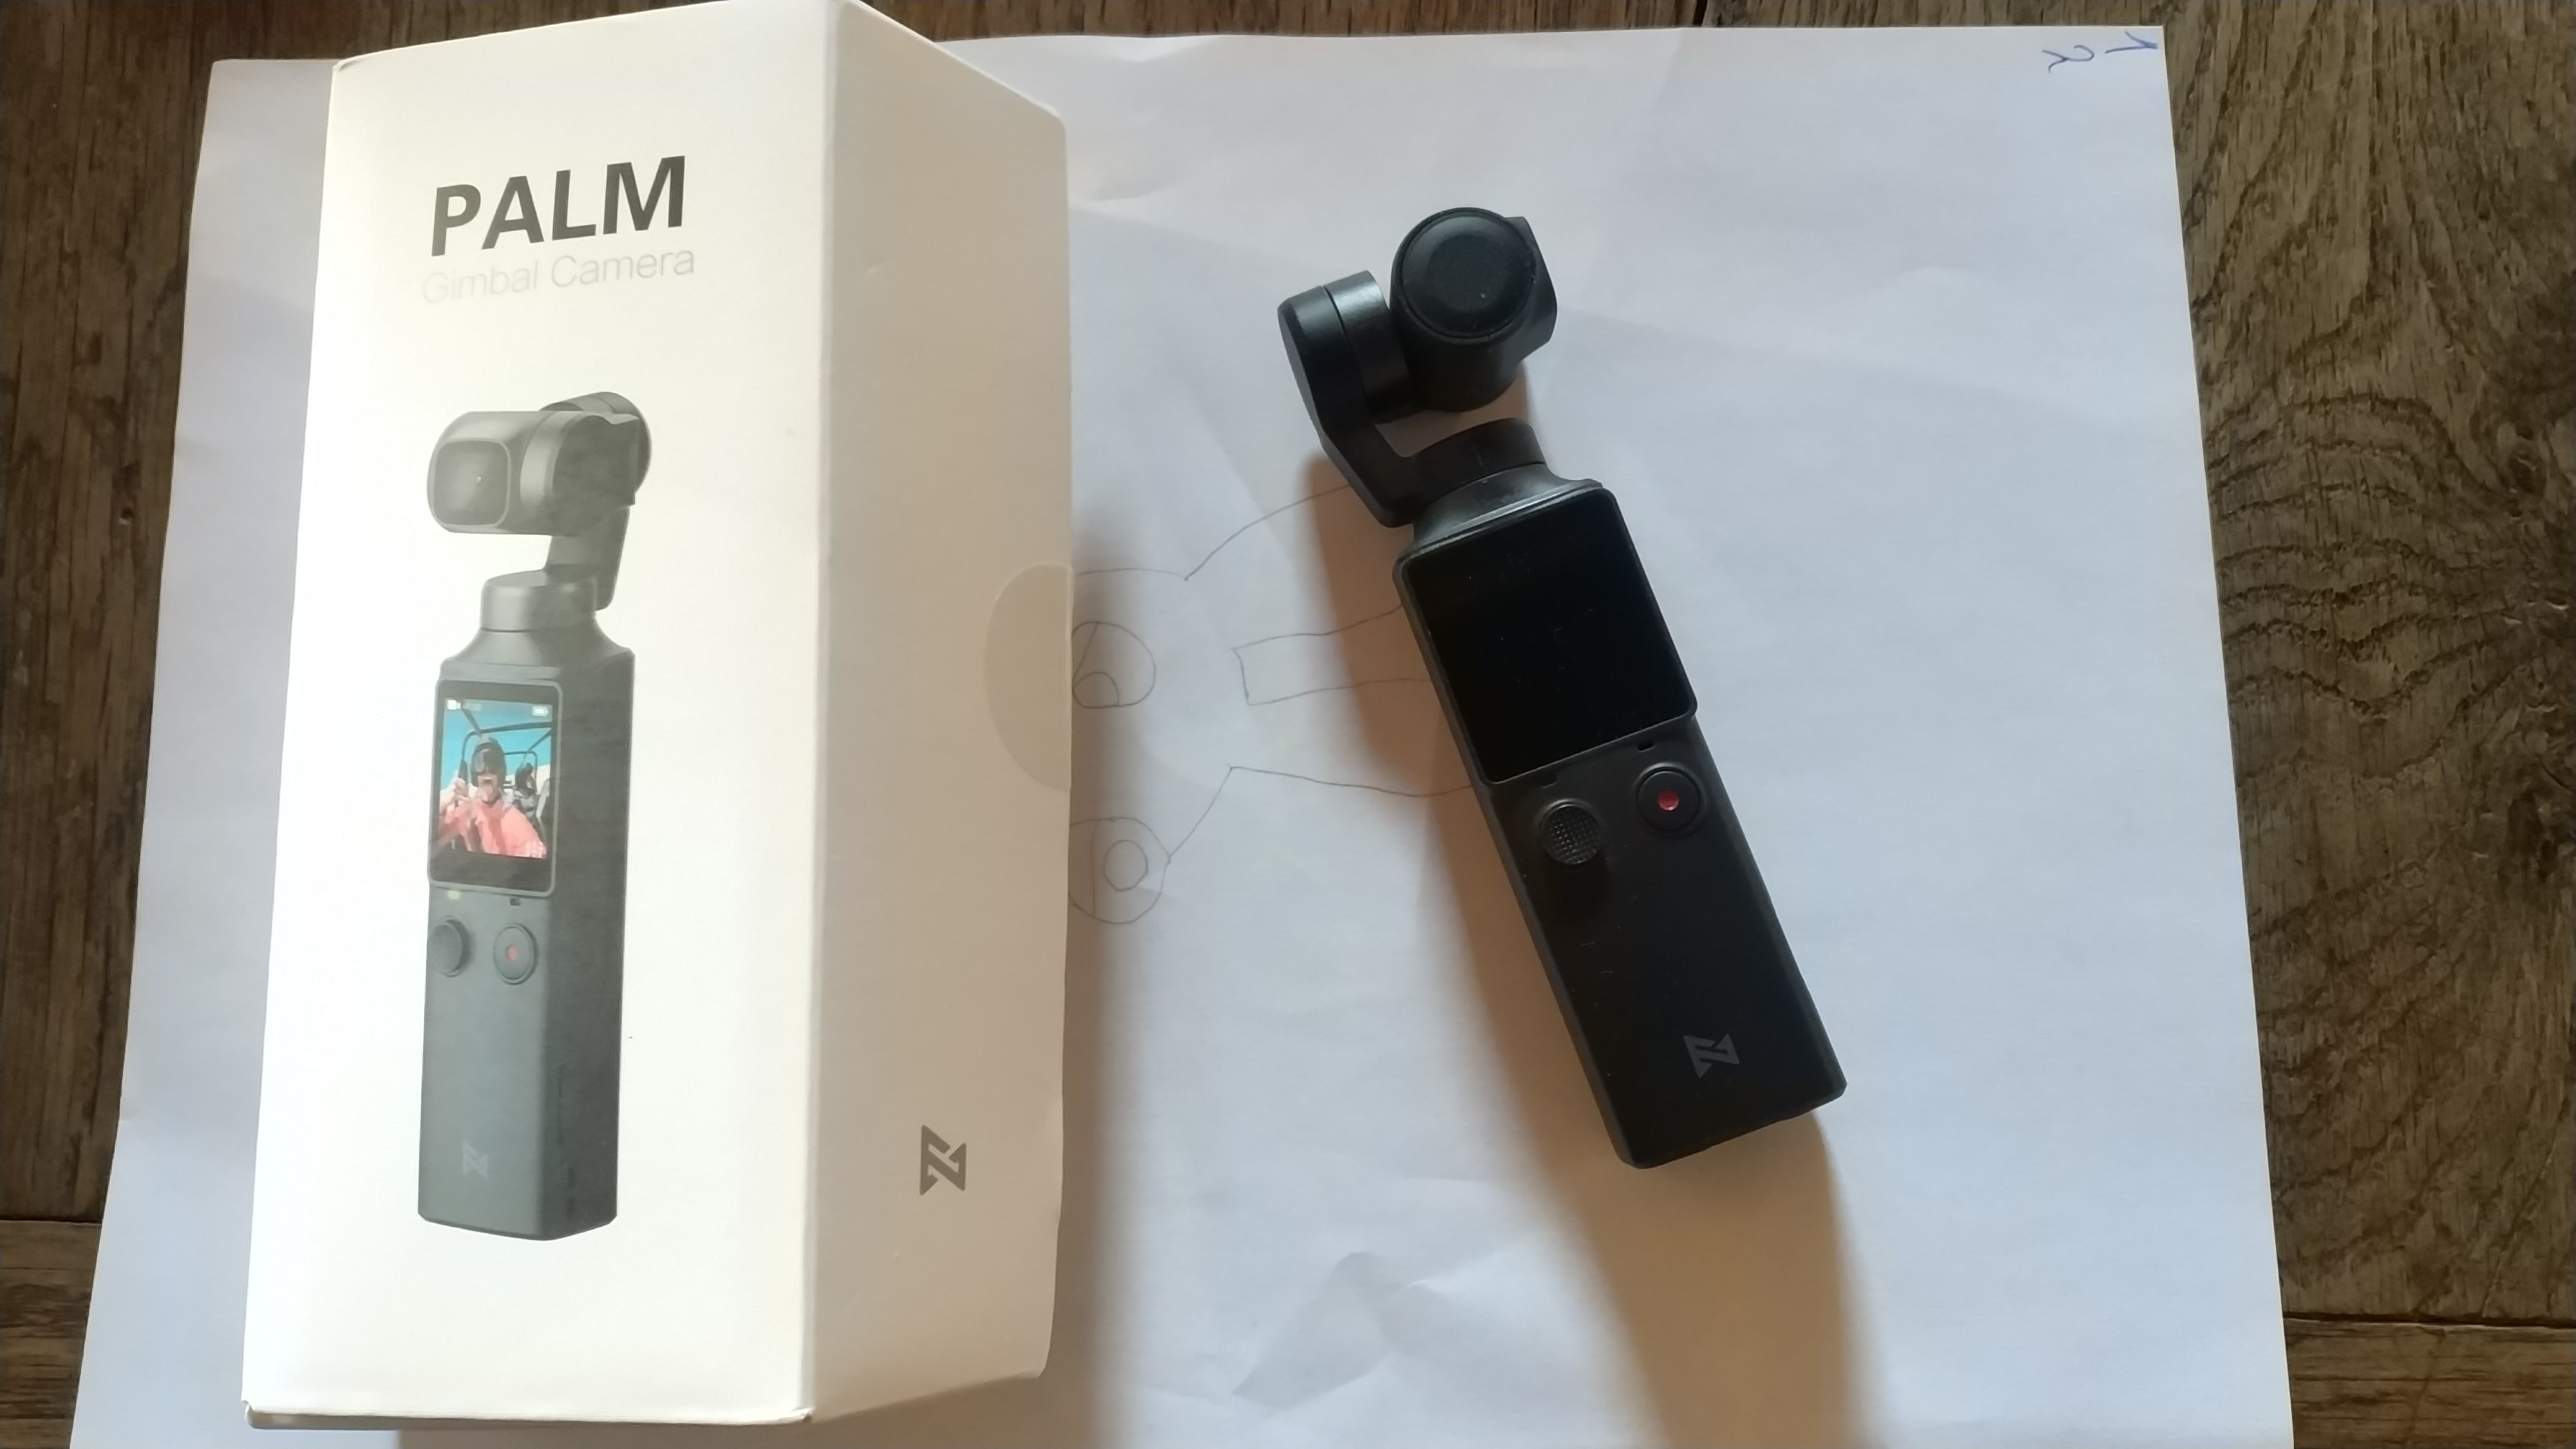 [VENDS] Caméra Xiaomi Fimi Palm. Img_2651